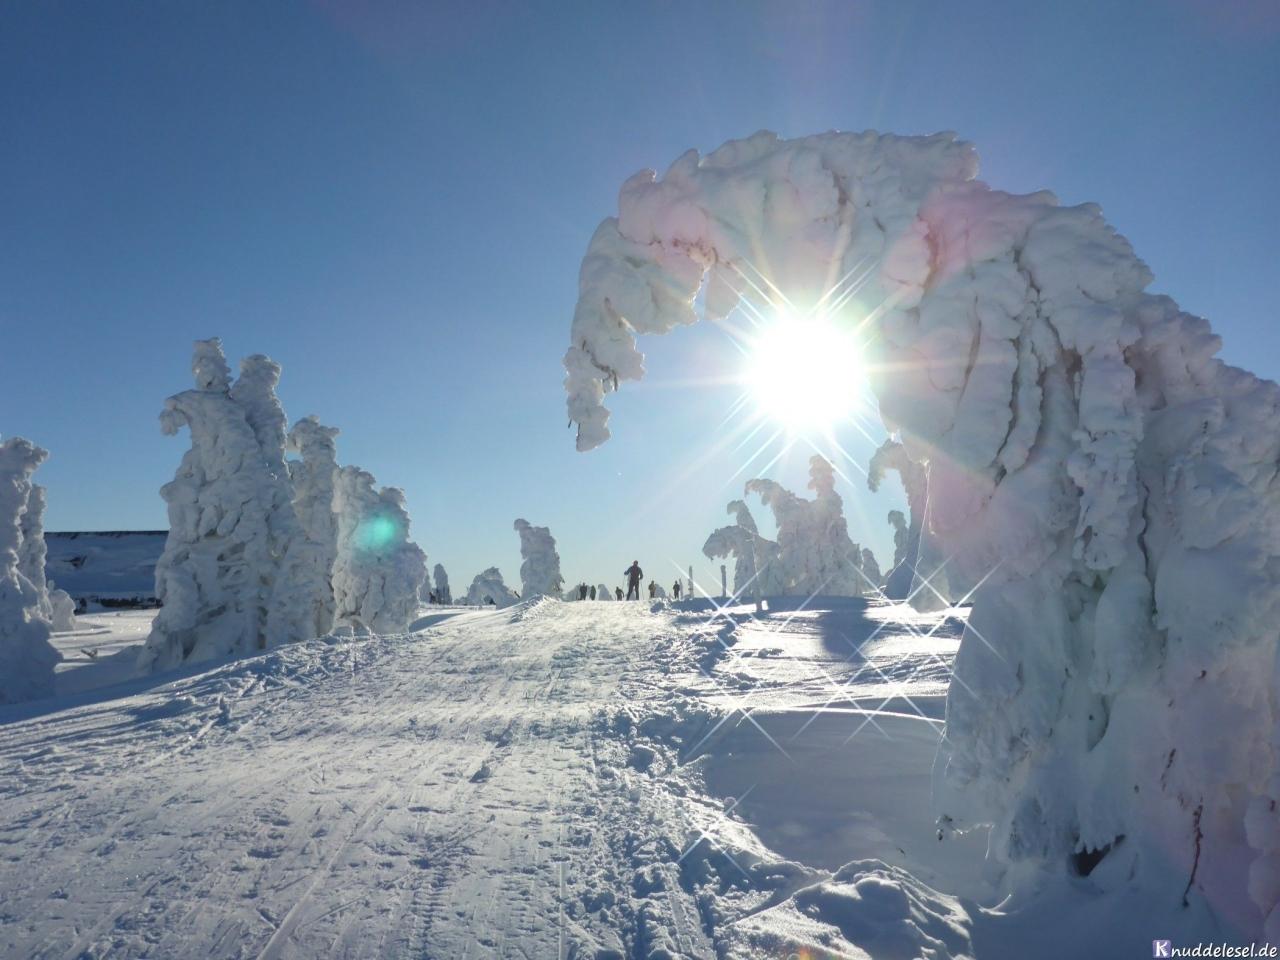 bf8d4cba5622631eacaaa9c2.jpg - #snow #riesengebirge #tschechien #percygermany #landschaft #urlaub #winteriscoming #naturephotography #schnee #schneezauber #landscape #travel #cold #winterlandschaft #januar #berg #photography